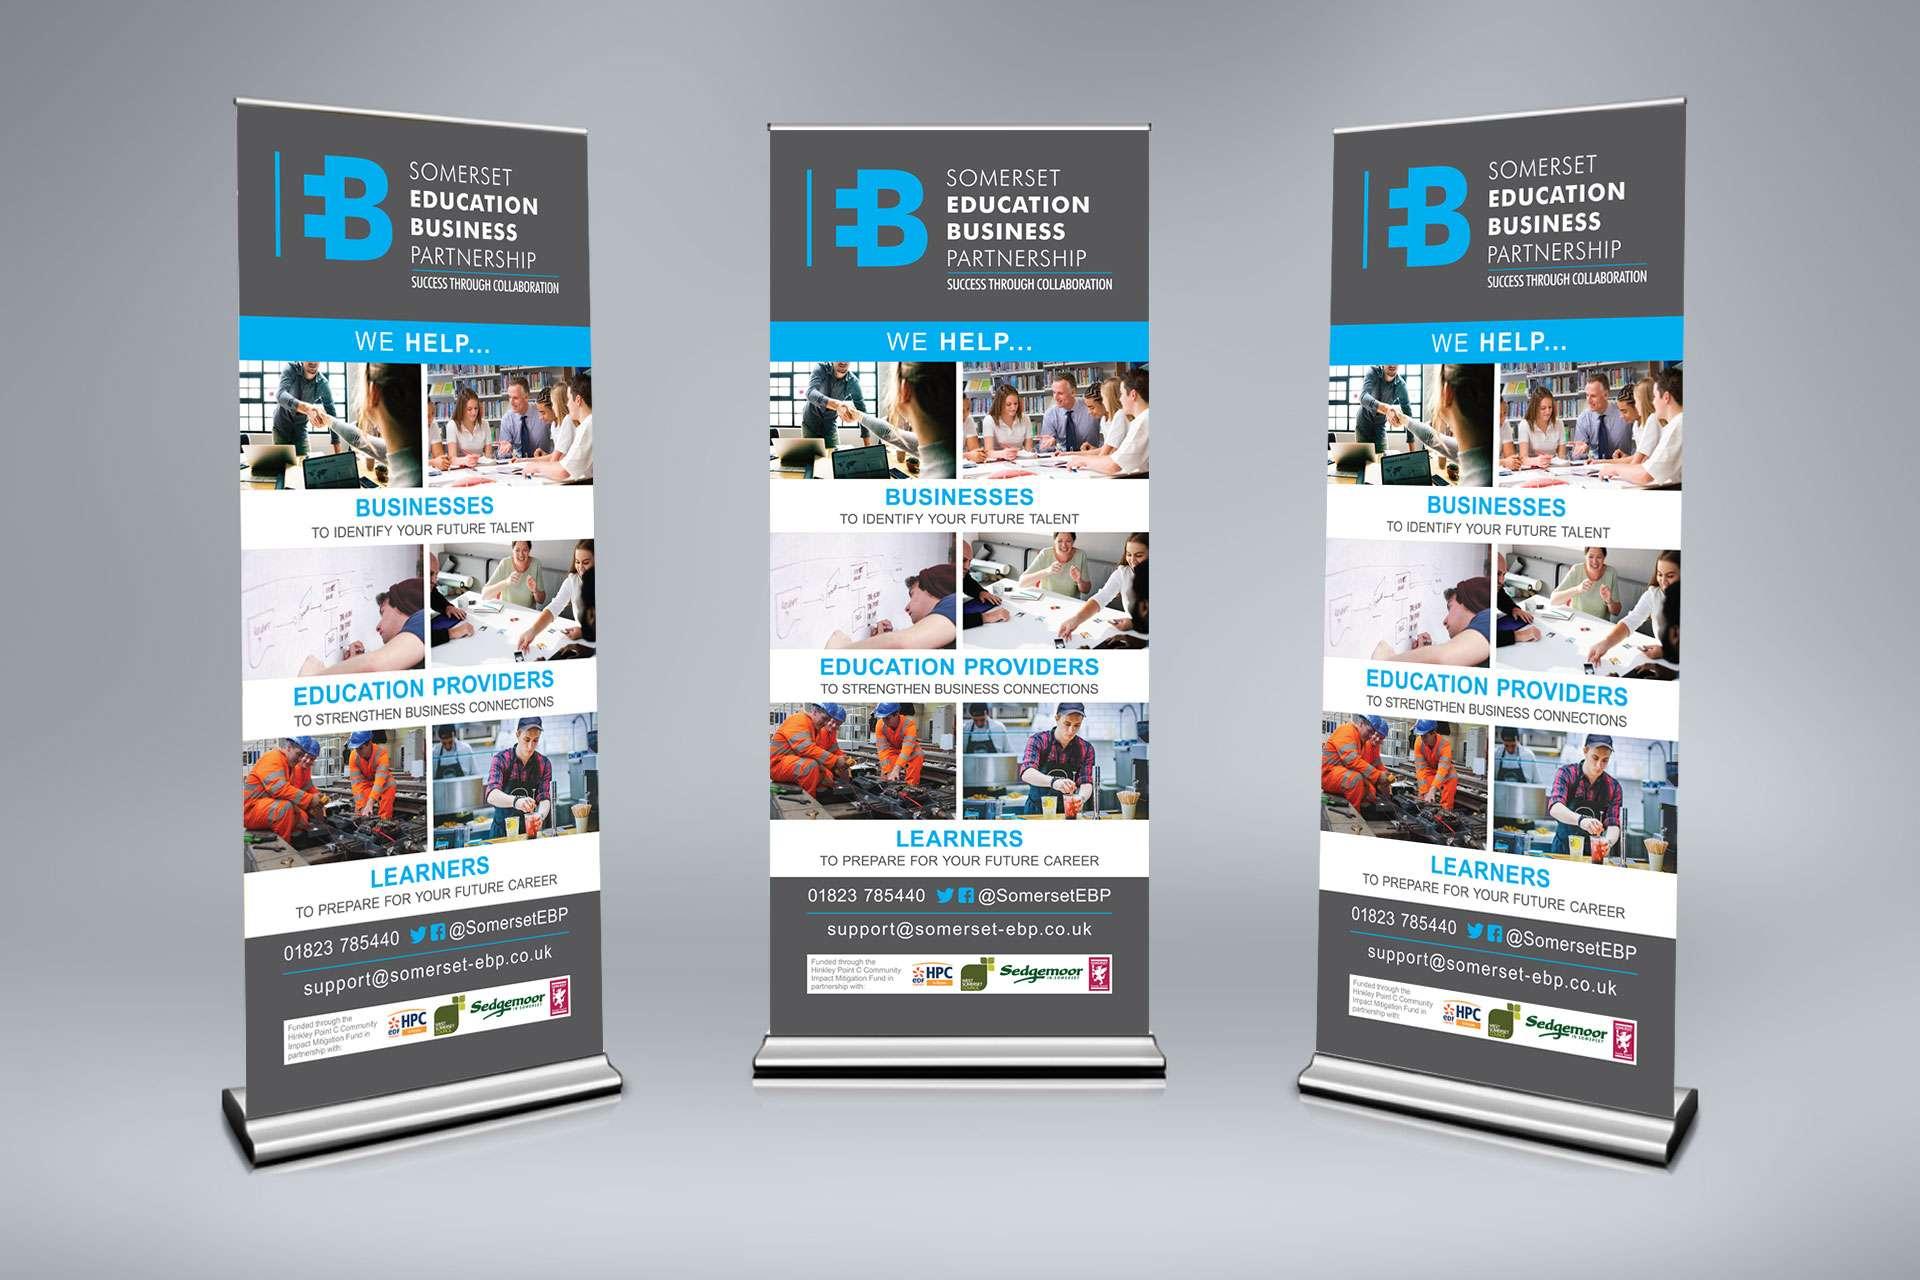 Somerset education business Partnership Pull Up Banner design